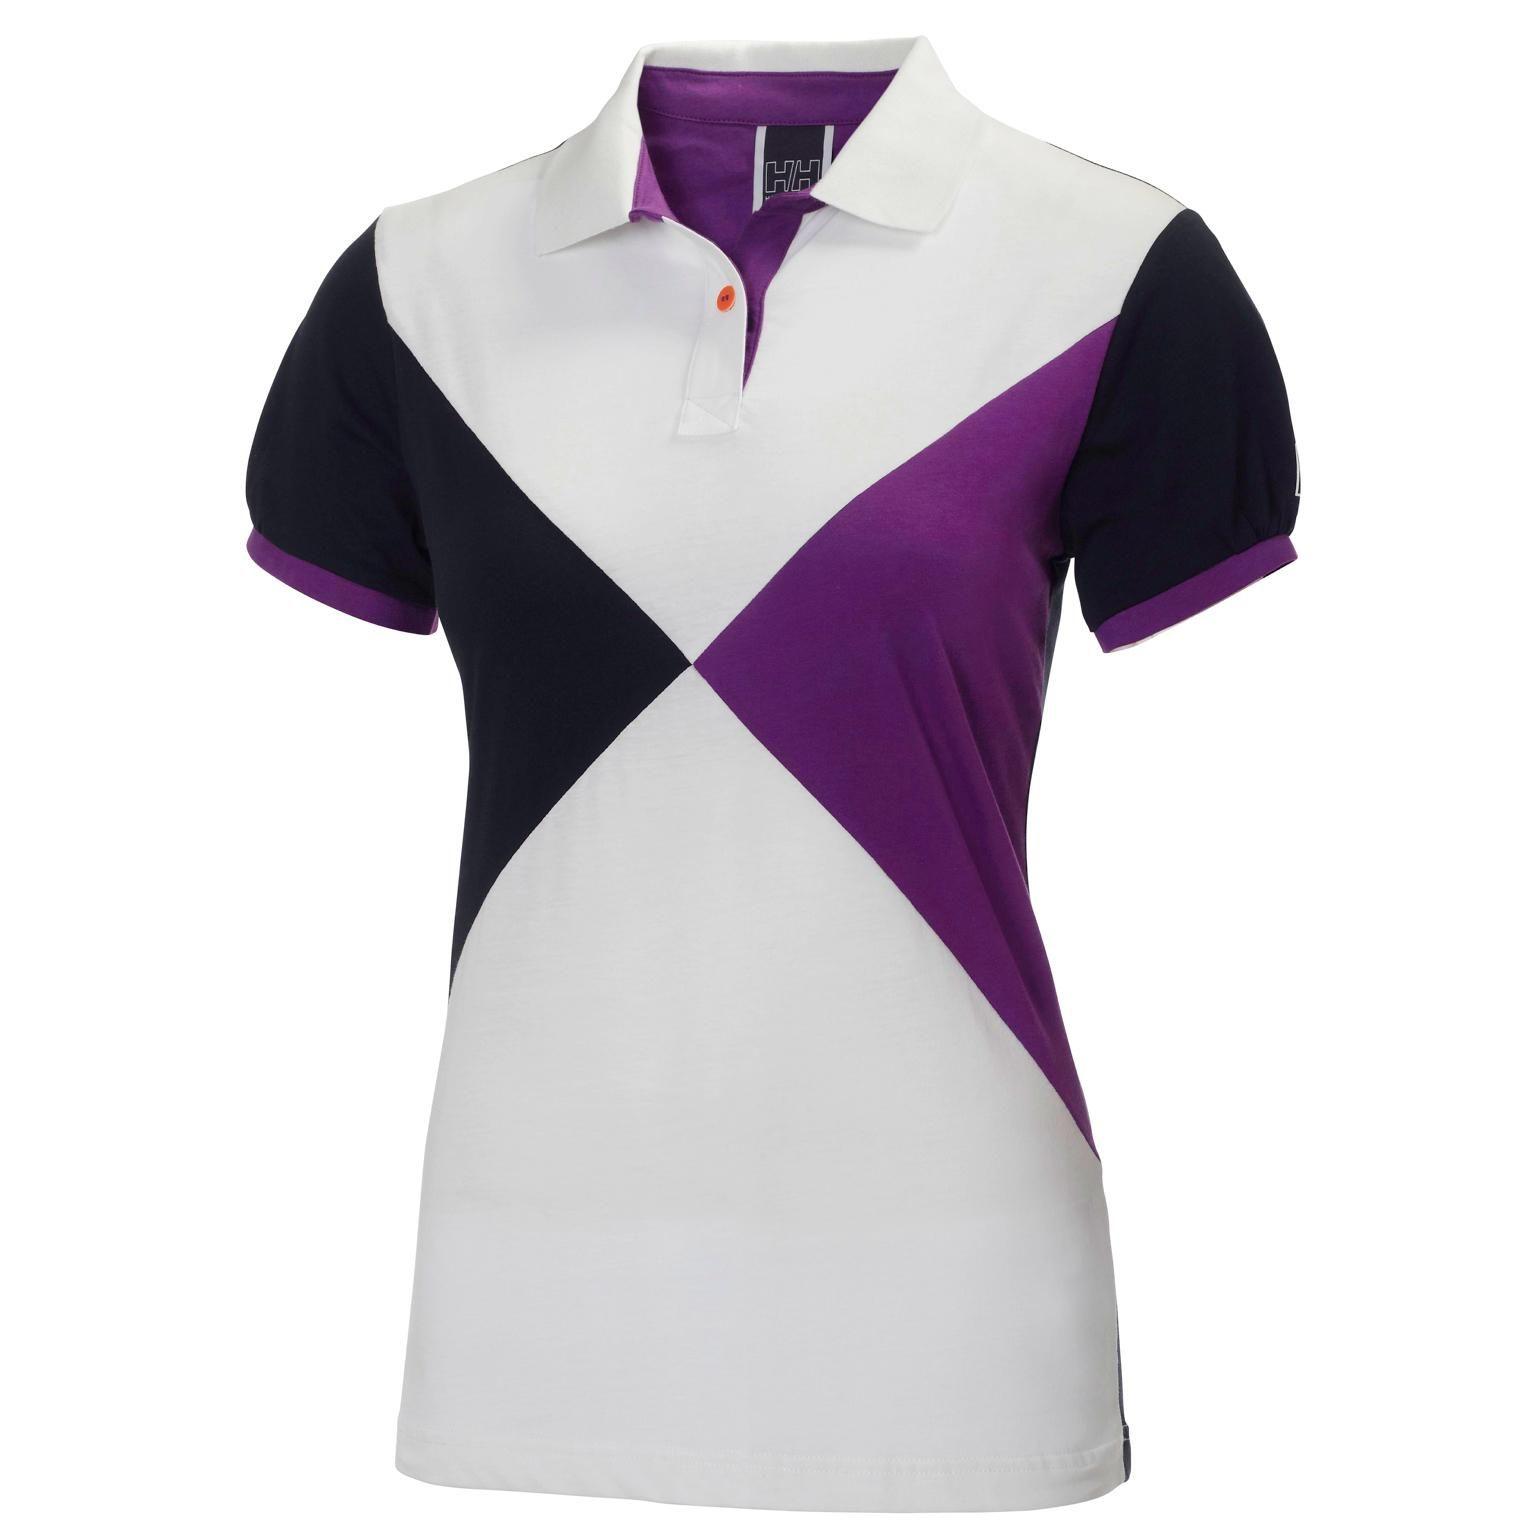 W Salt Polo Women Shirts Polos Helly Hansen Official Online